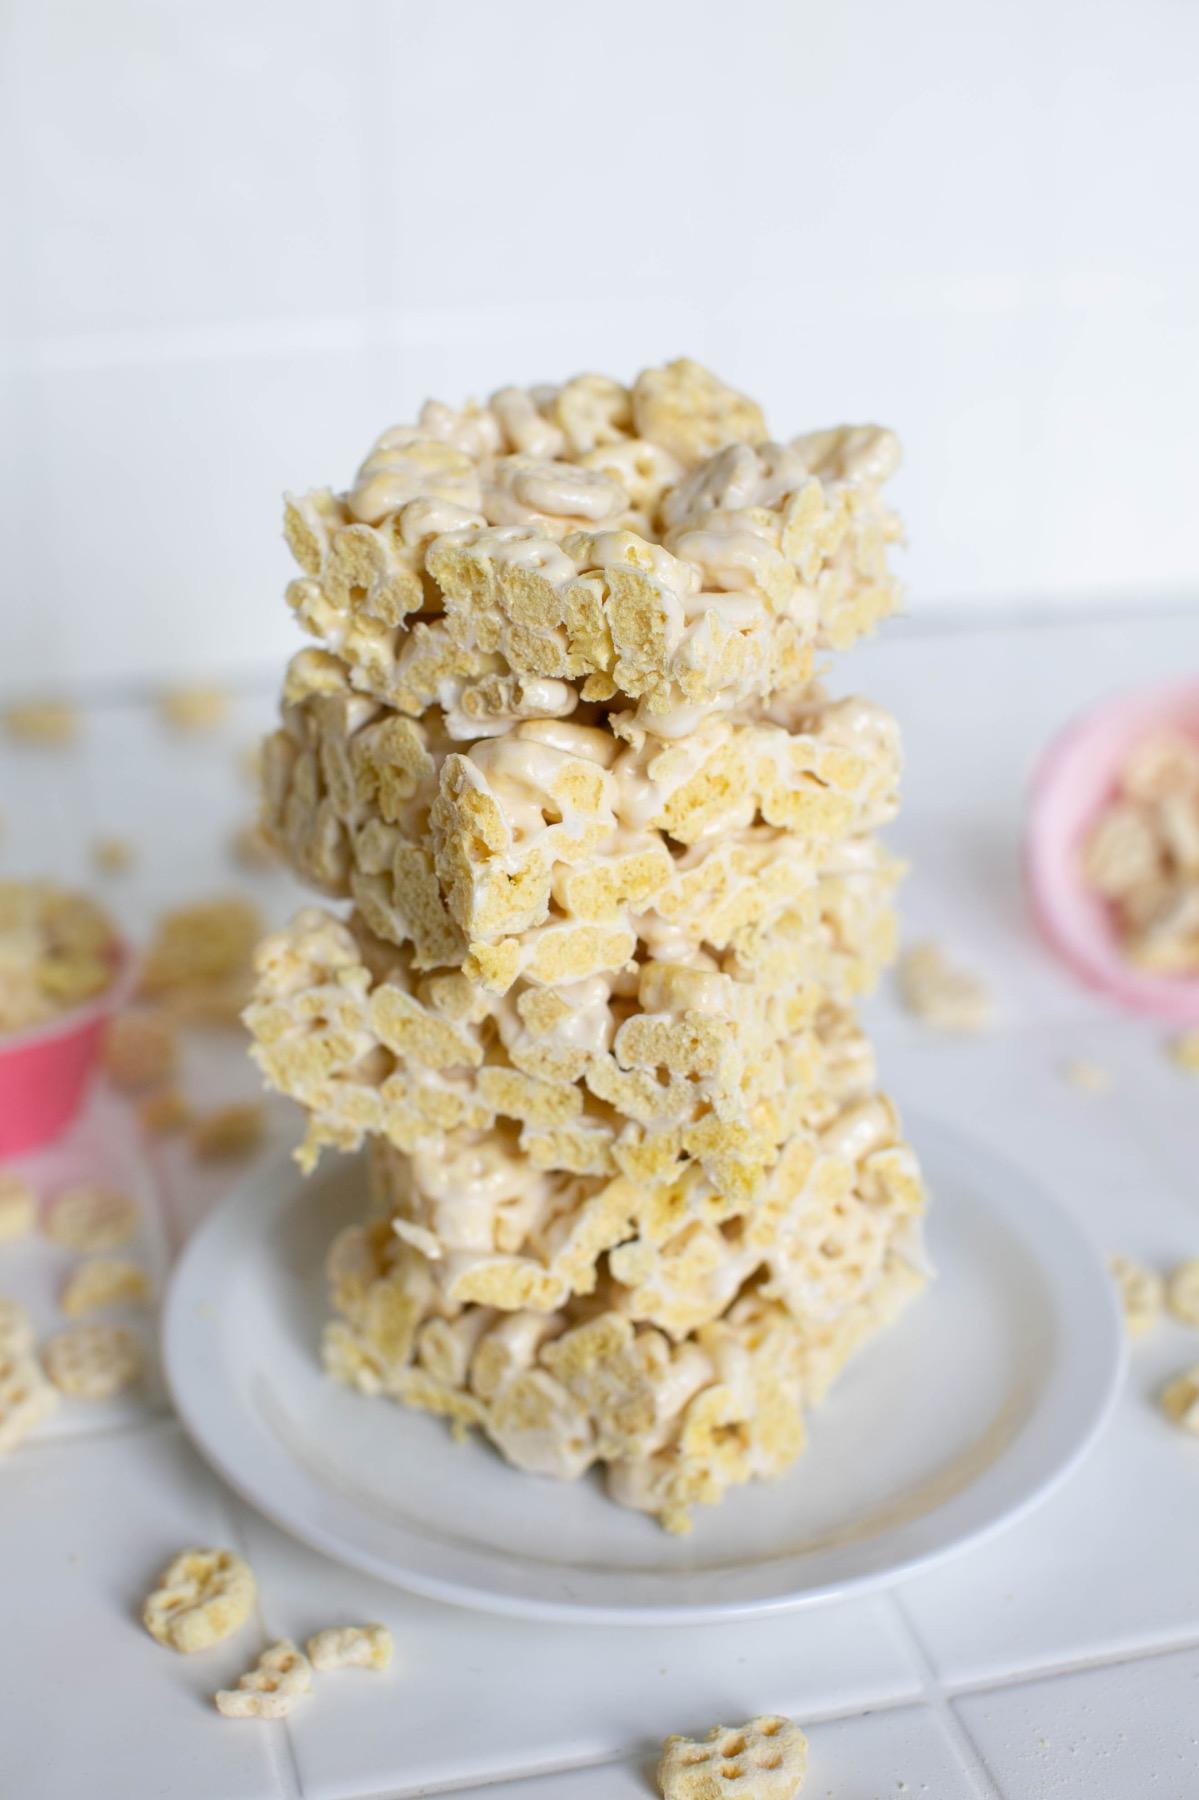 stack of honeycomb marshmallow treats pop shop america